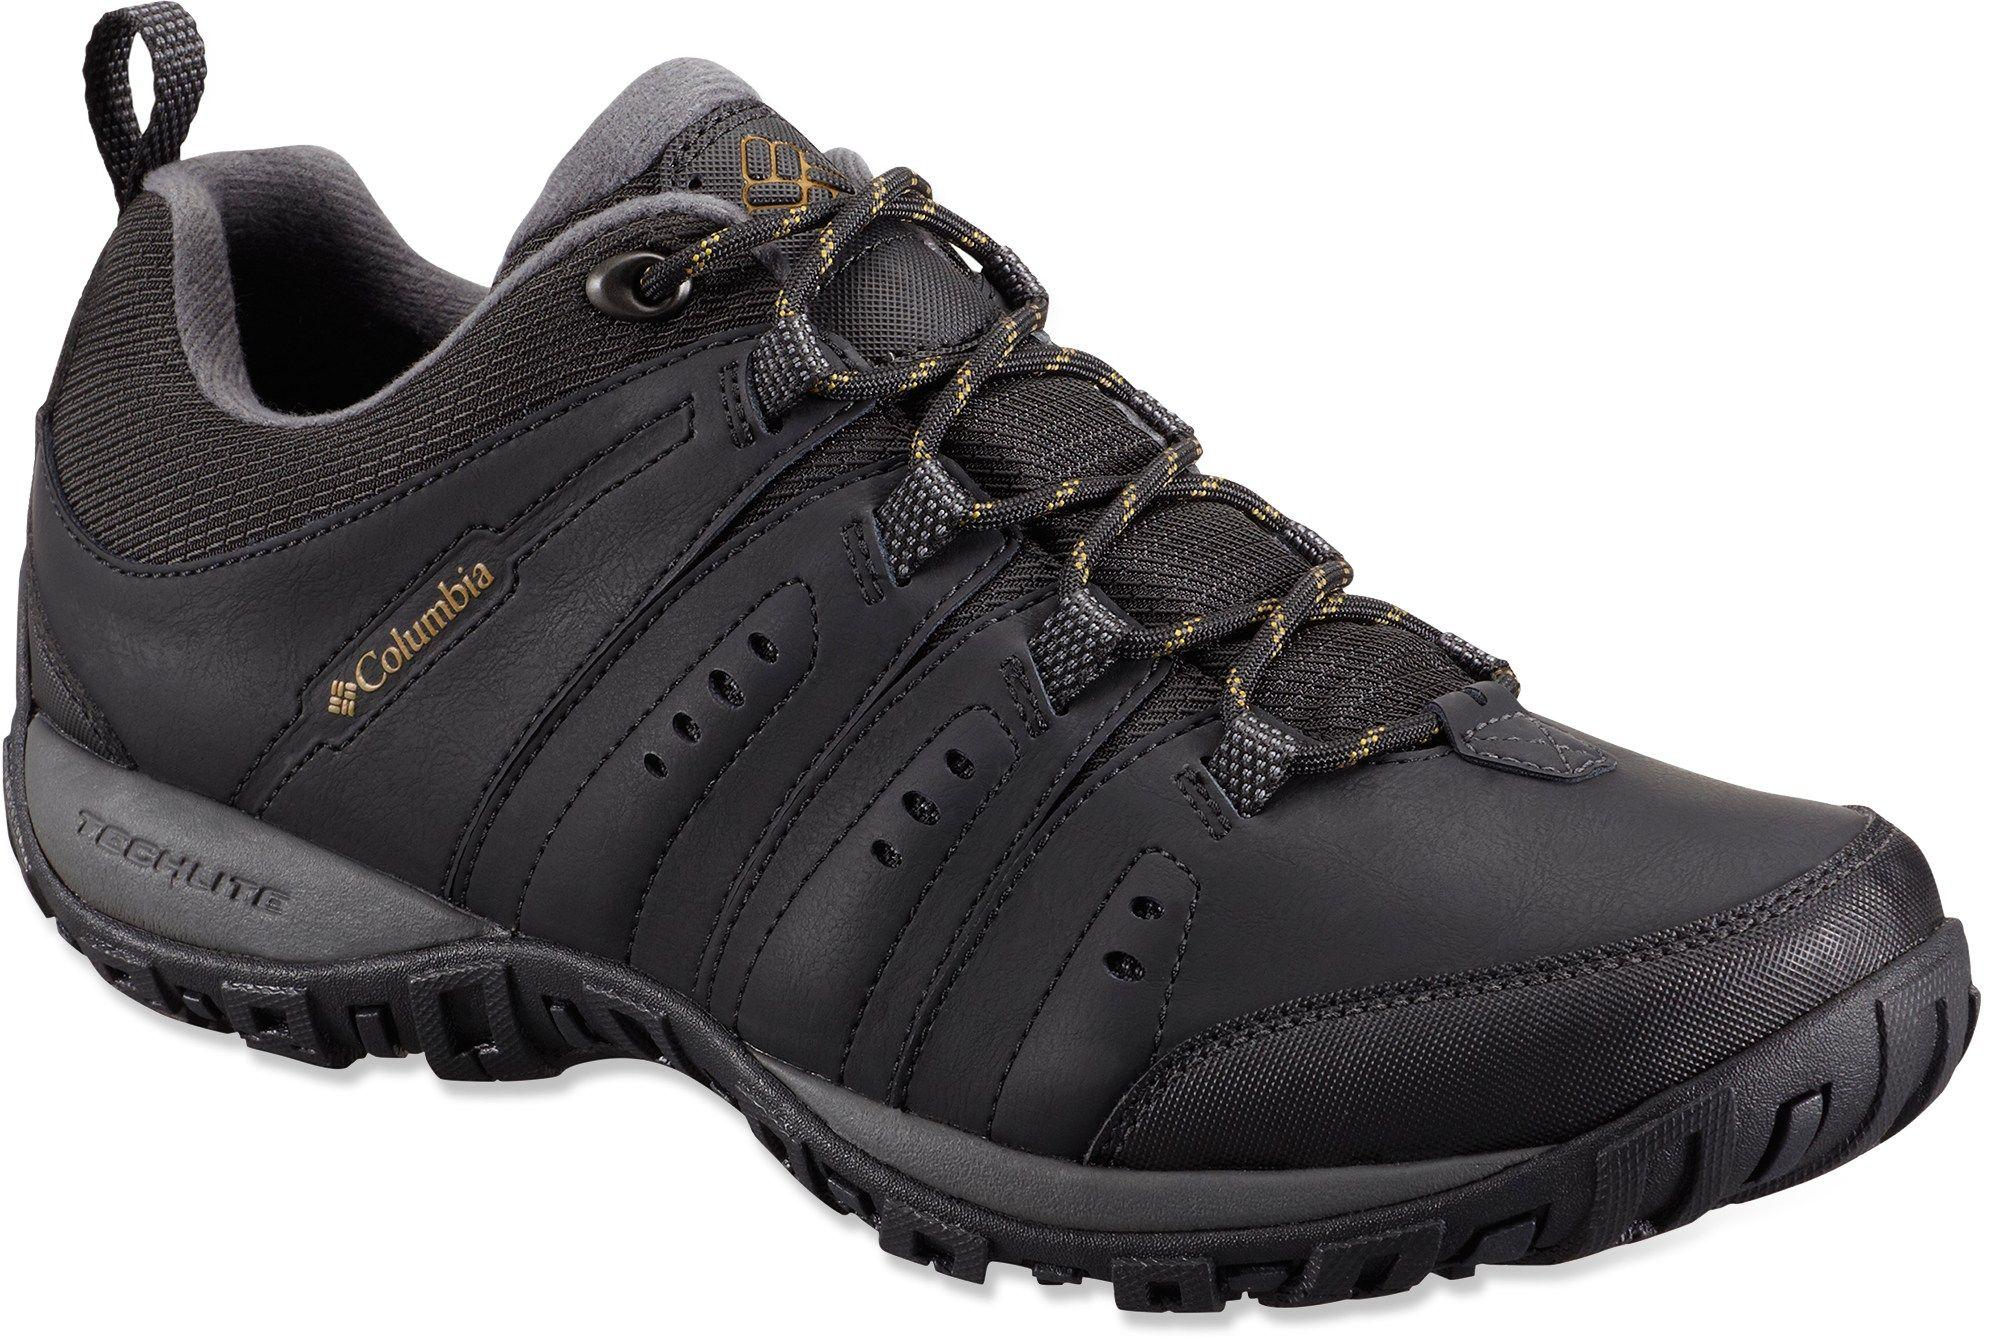 Details zu Columbia Peakfreak Nomad Waterproof Herren Schuhe Sneaker Leder Outdoor NEU